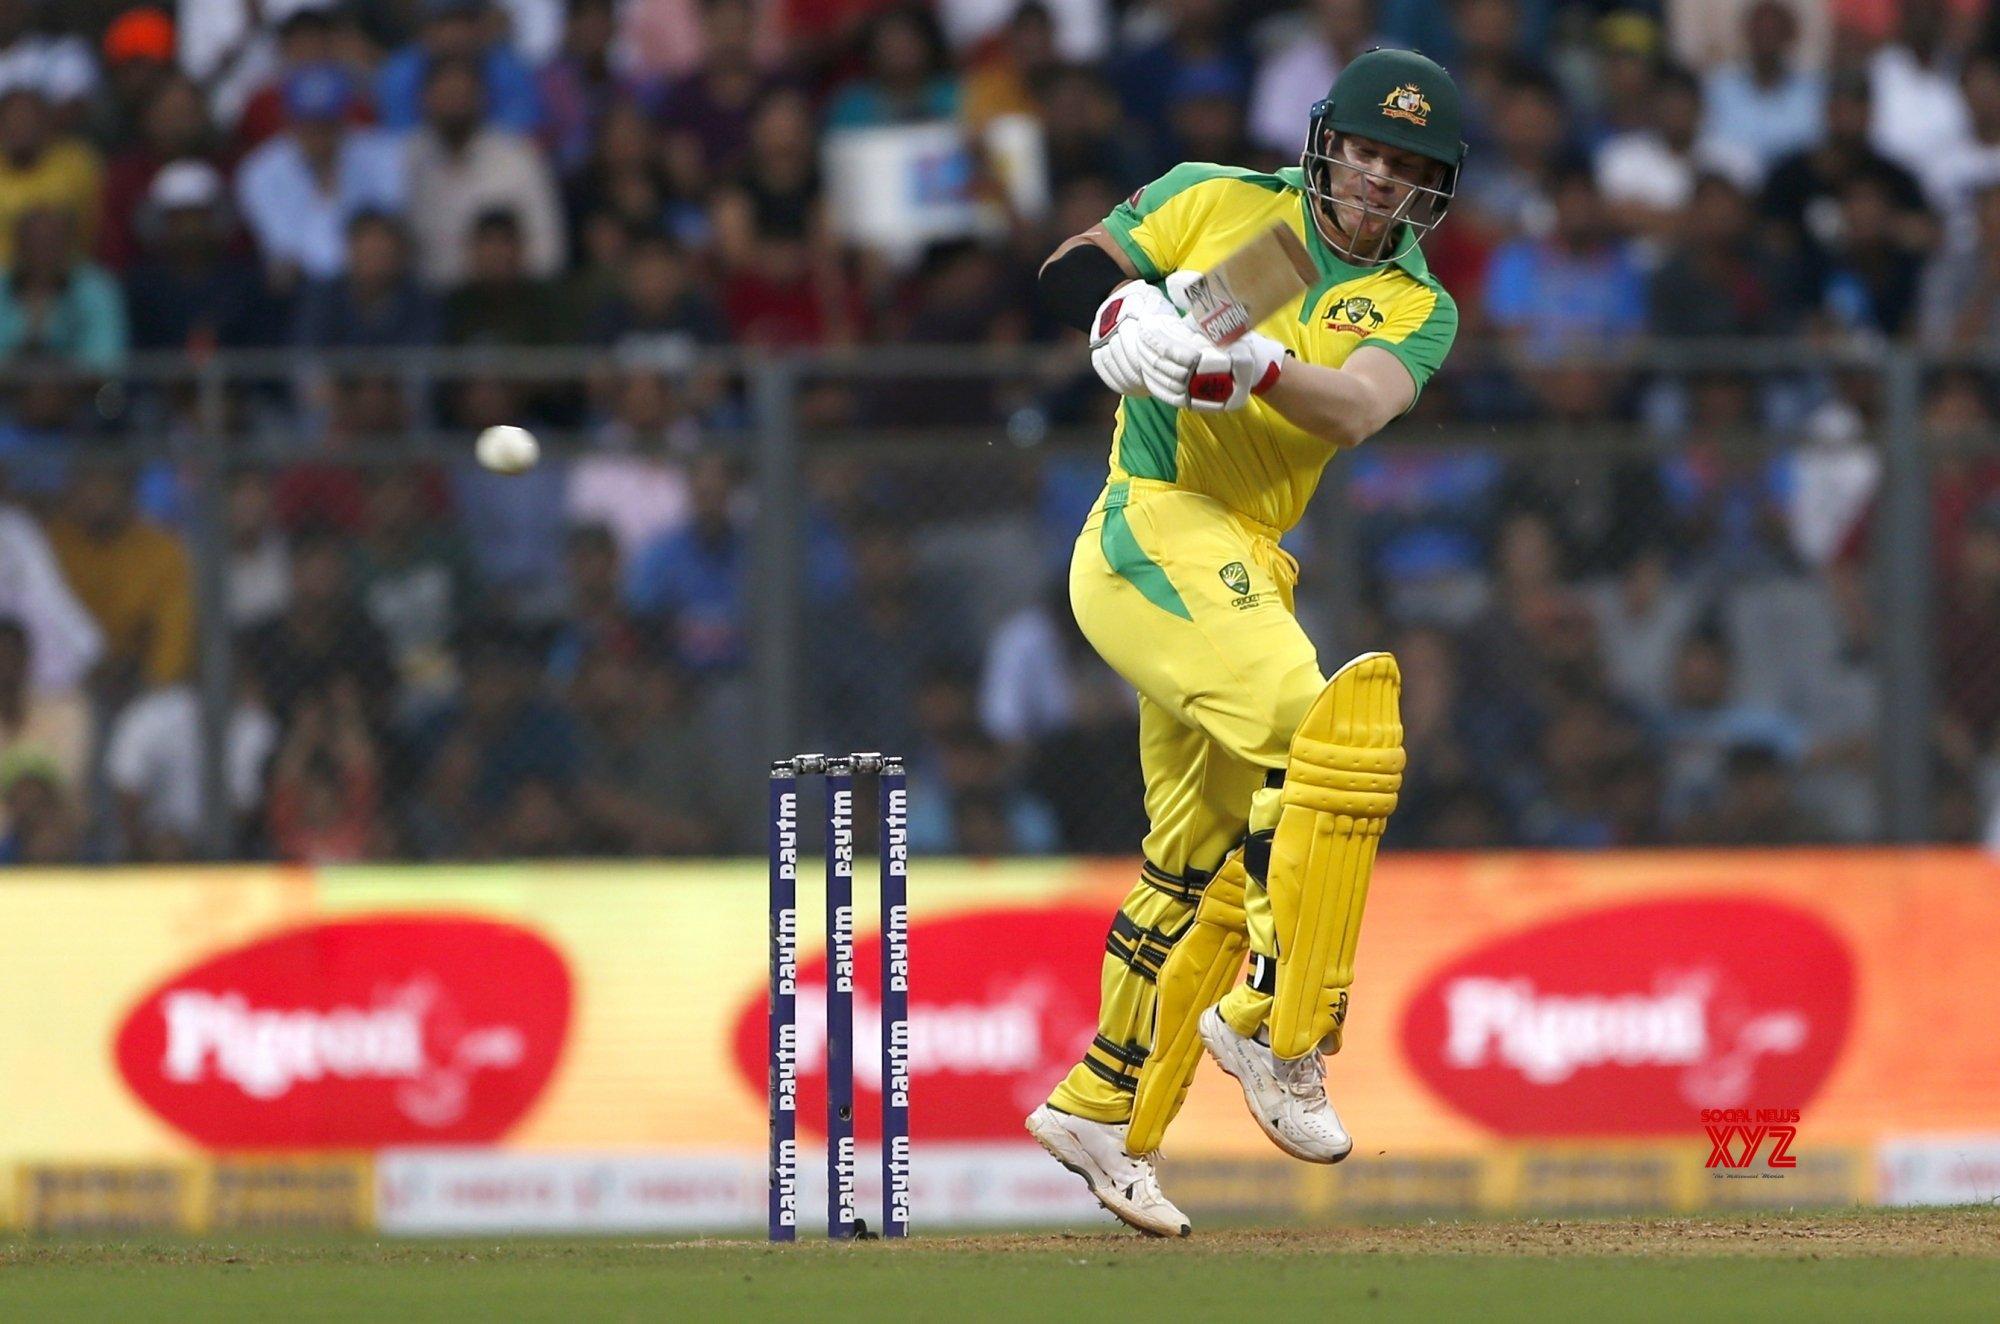 Mumbai: 1st ODI - India Vs Australia (Batch - 30) #Gallery